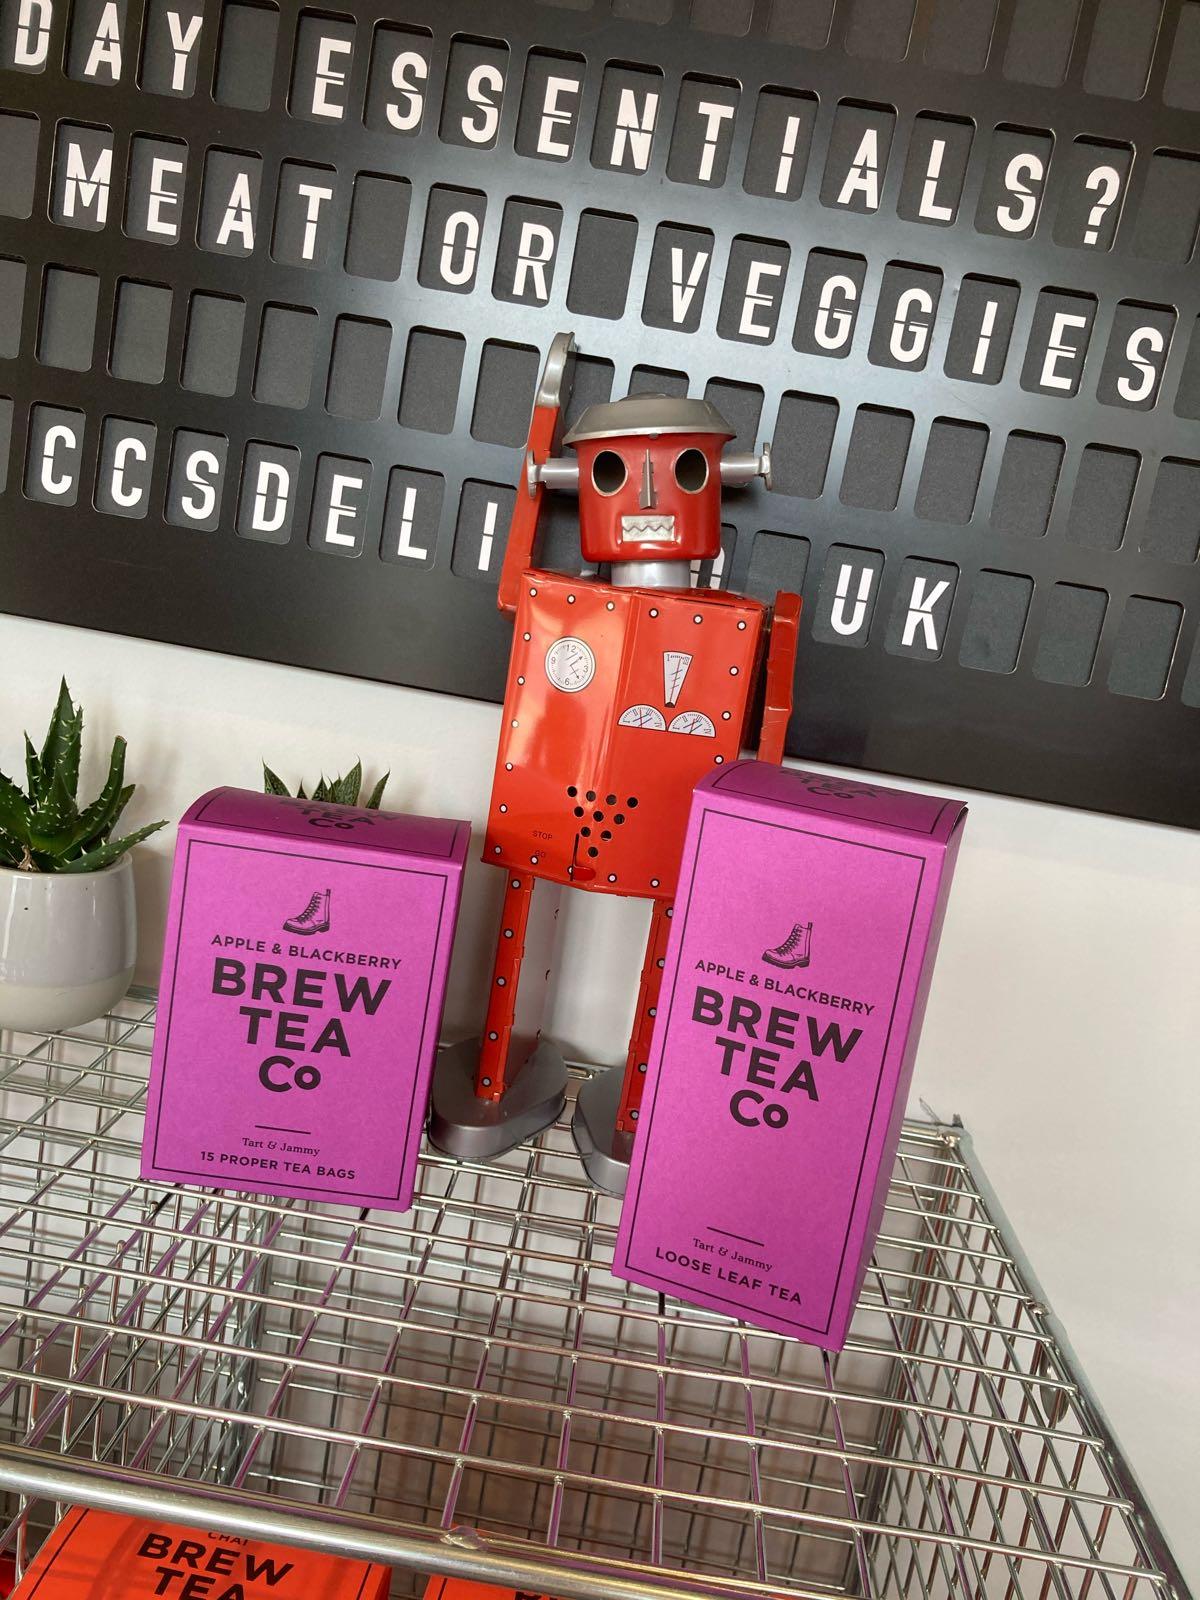 Brew Tea Co Apple & Blackberry - 1/4lb Loose Leaf